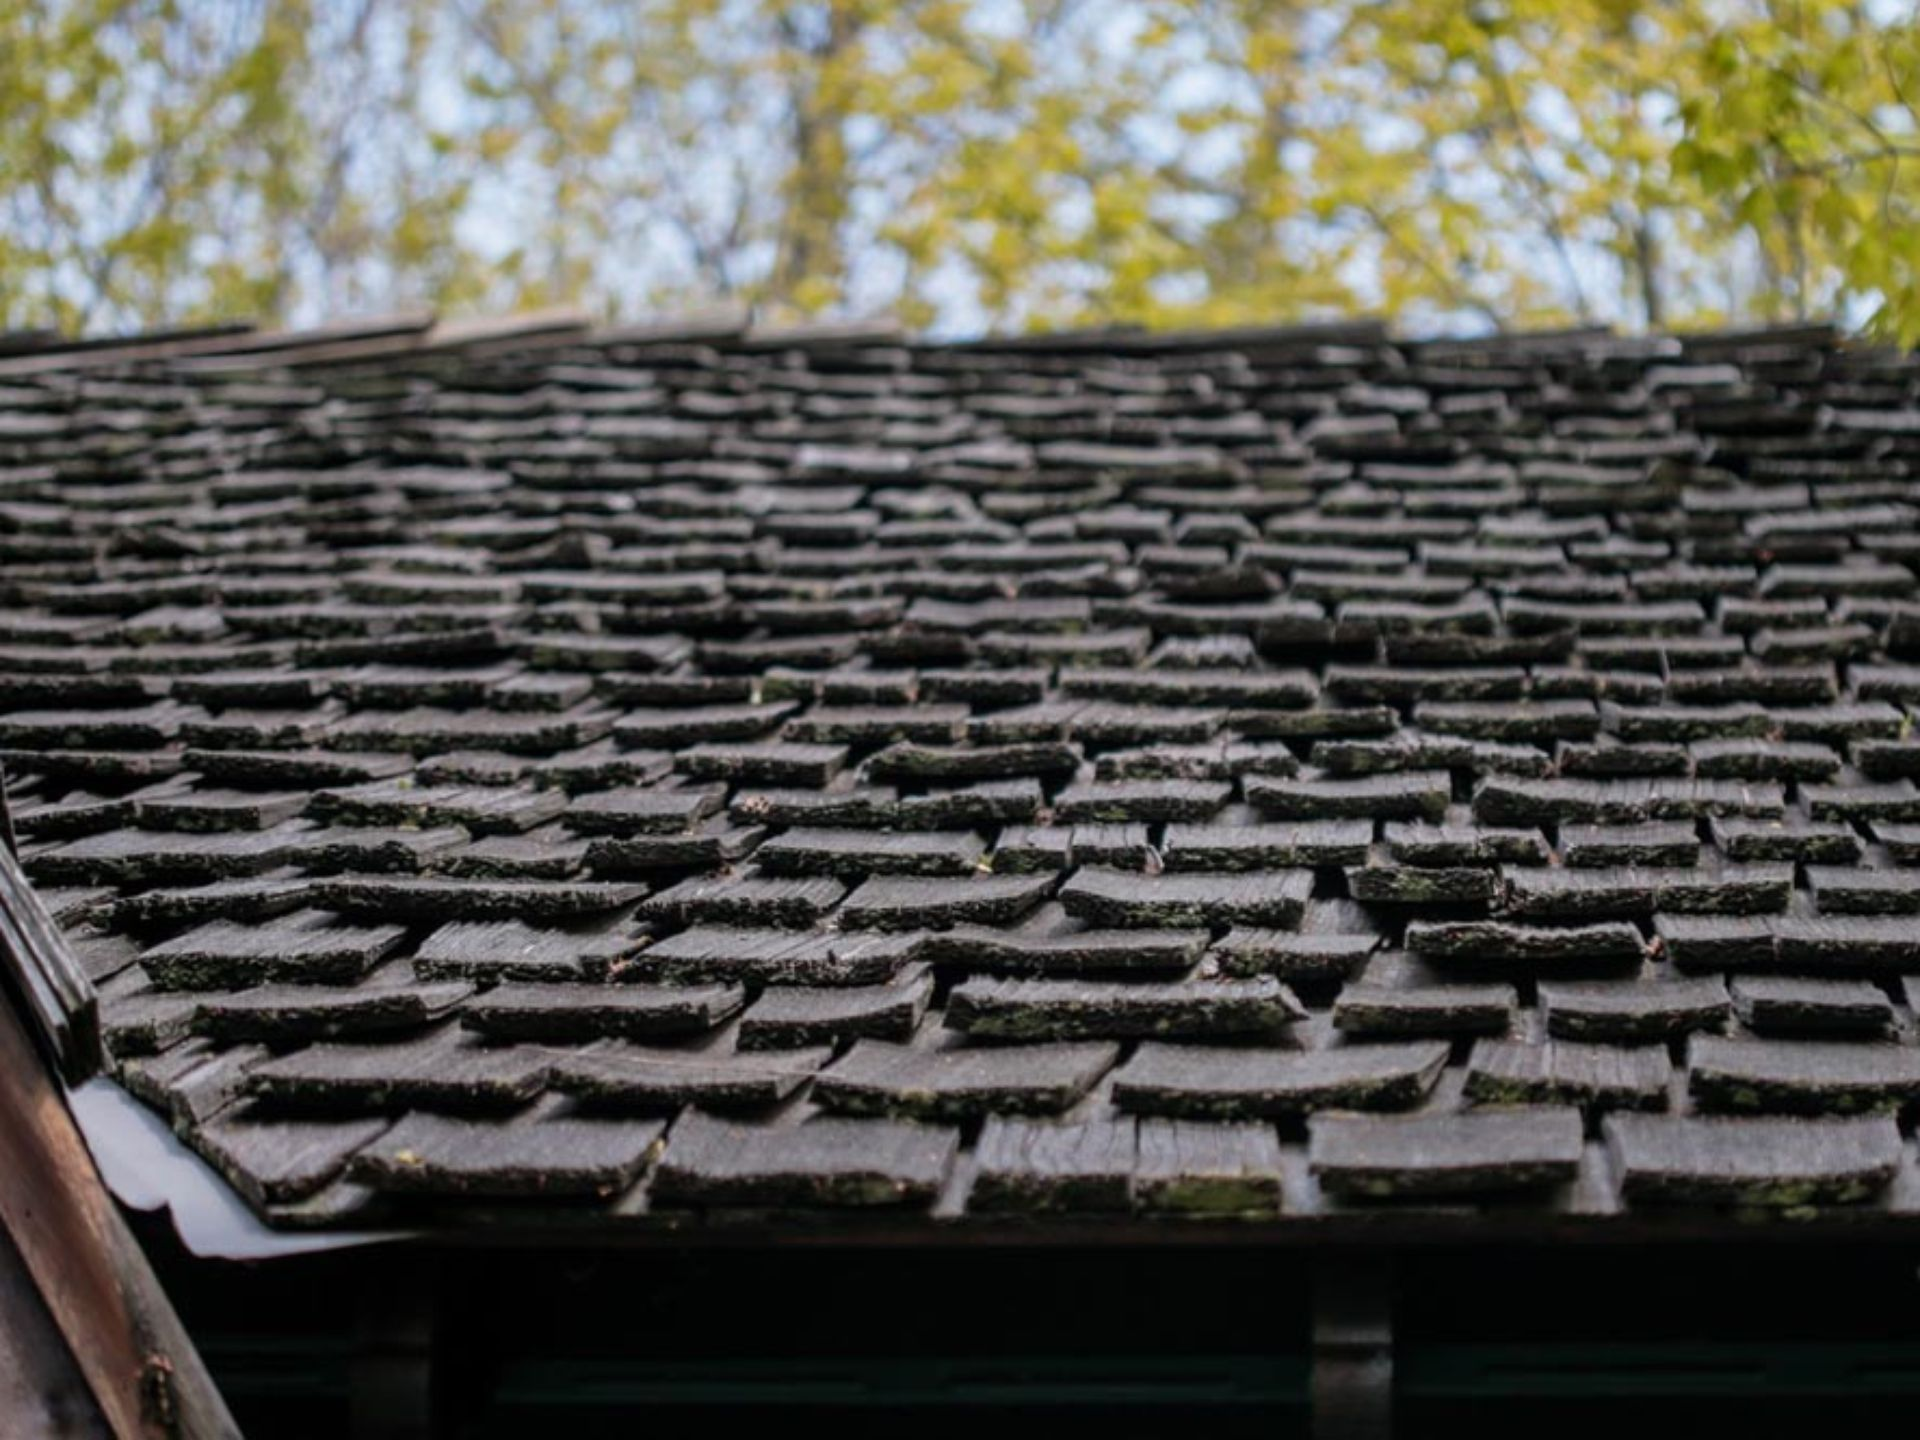 1 Of A Kind Home On 87 Acres Has Waterfall Cedar Sauna Wood Shingles Roof Shingles Wood